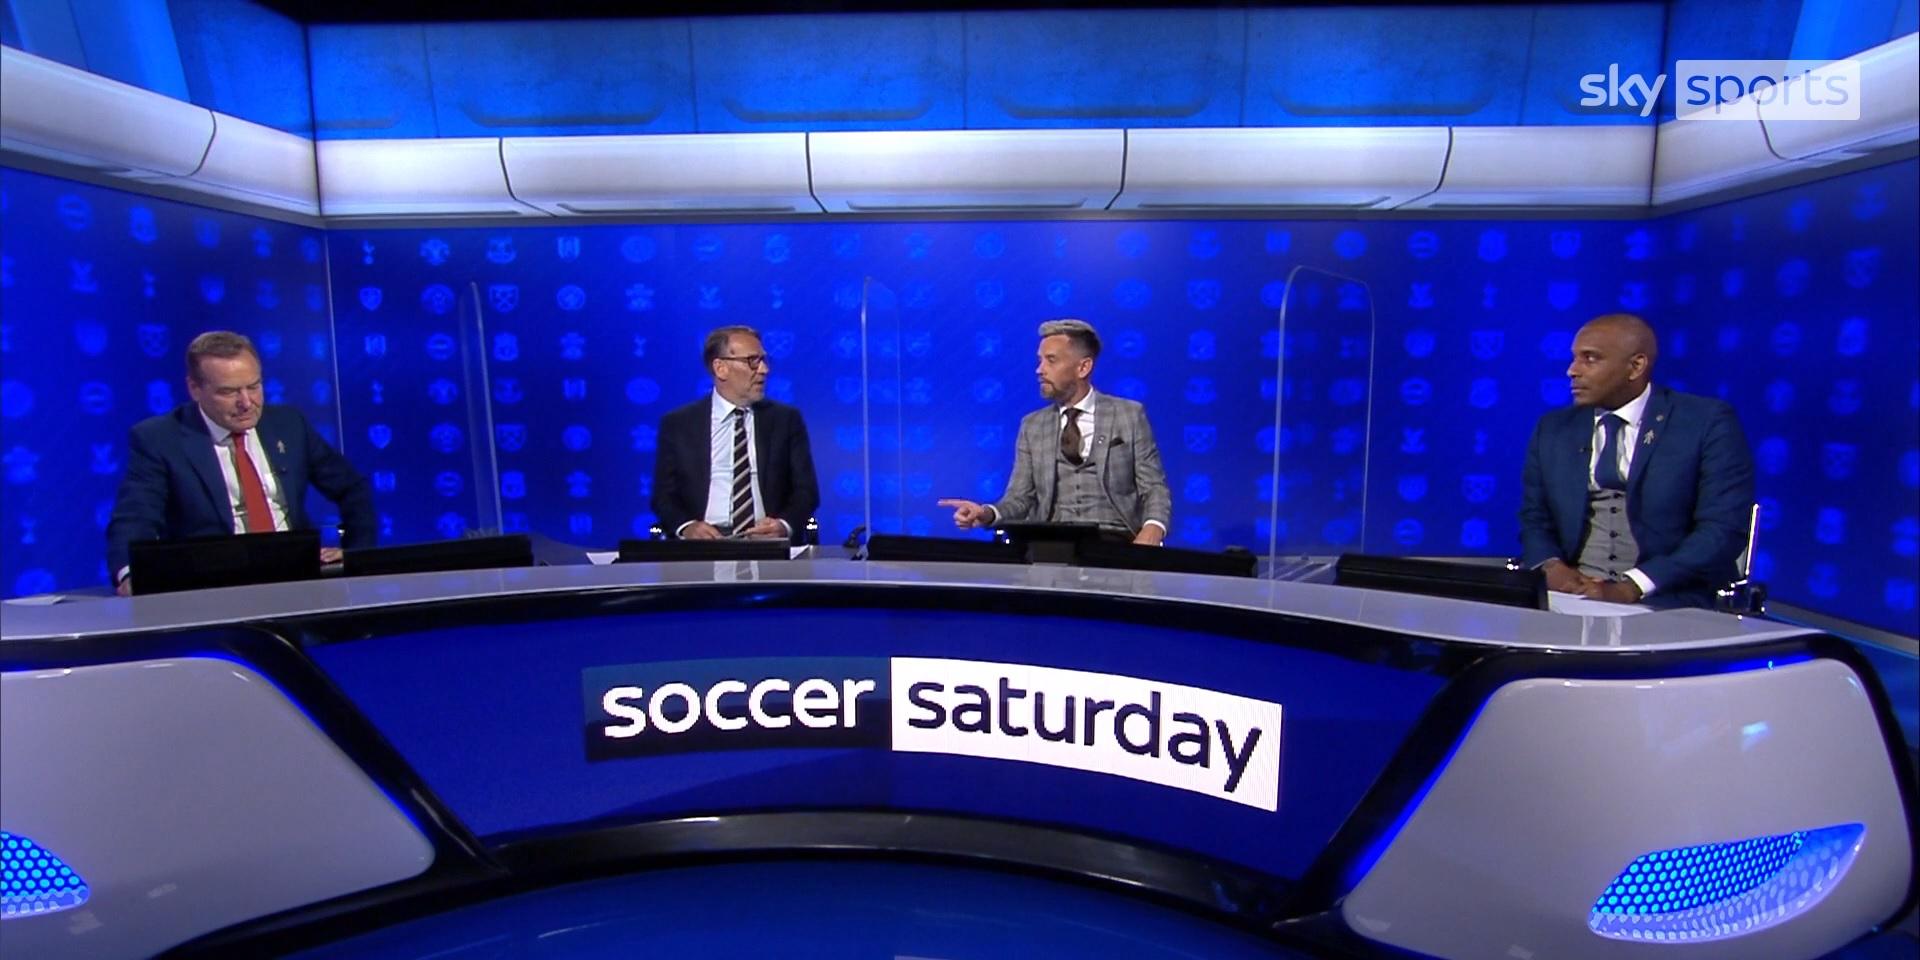 (Video) Paul Merson makes big Liverpool prediction 'if Van Dijk plays every game next season'